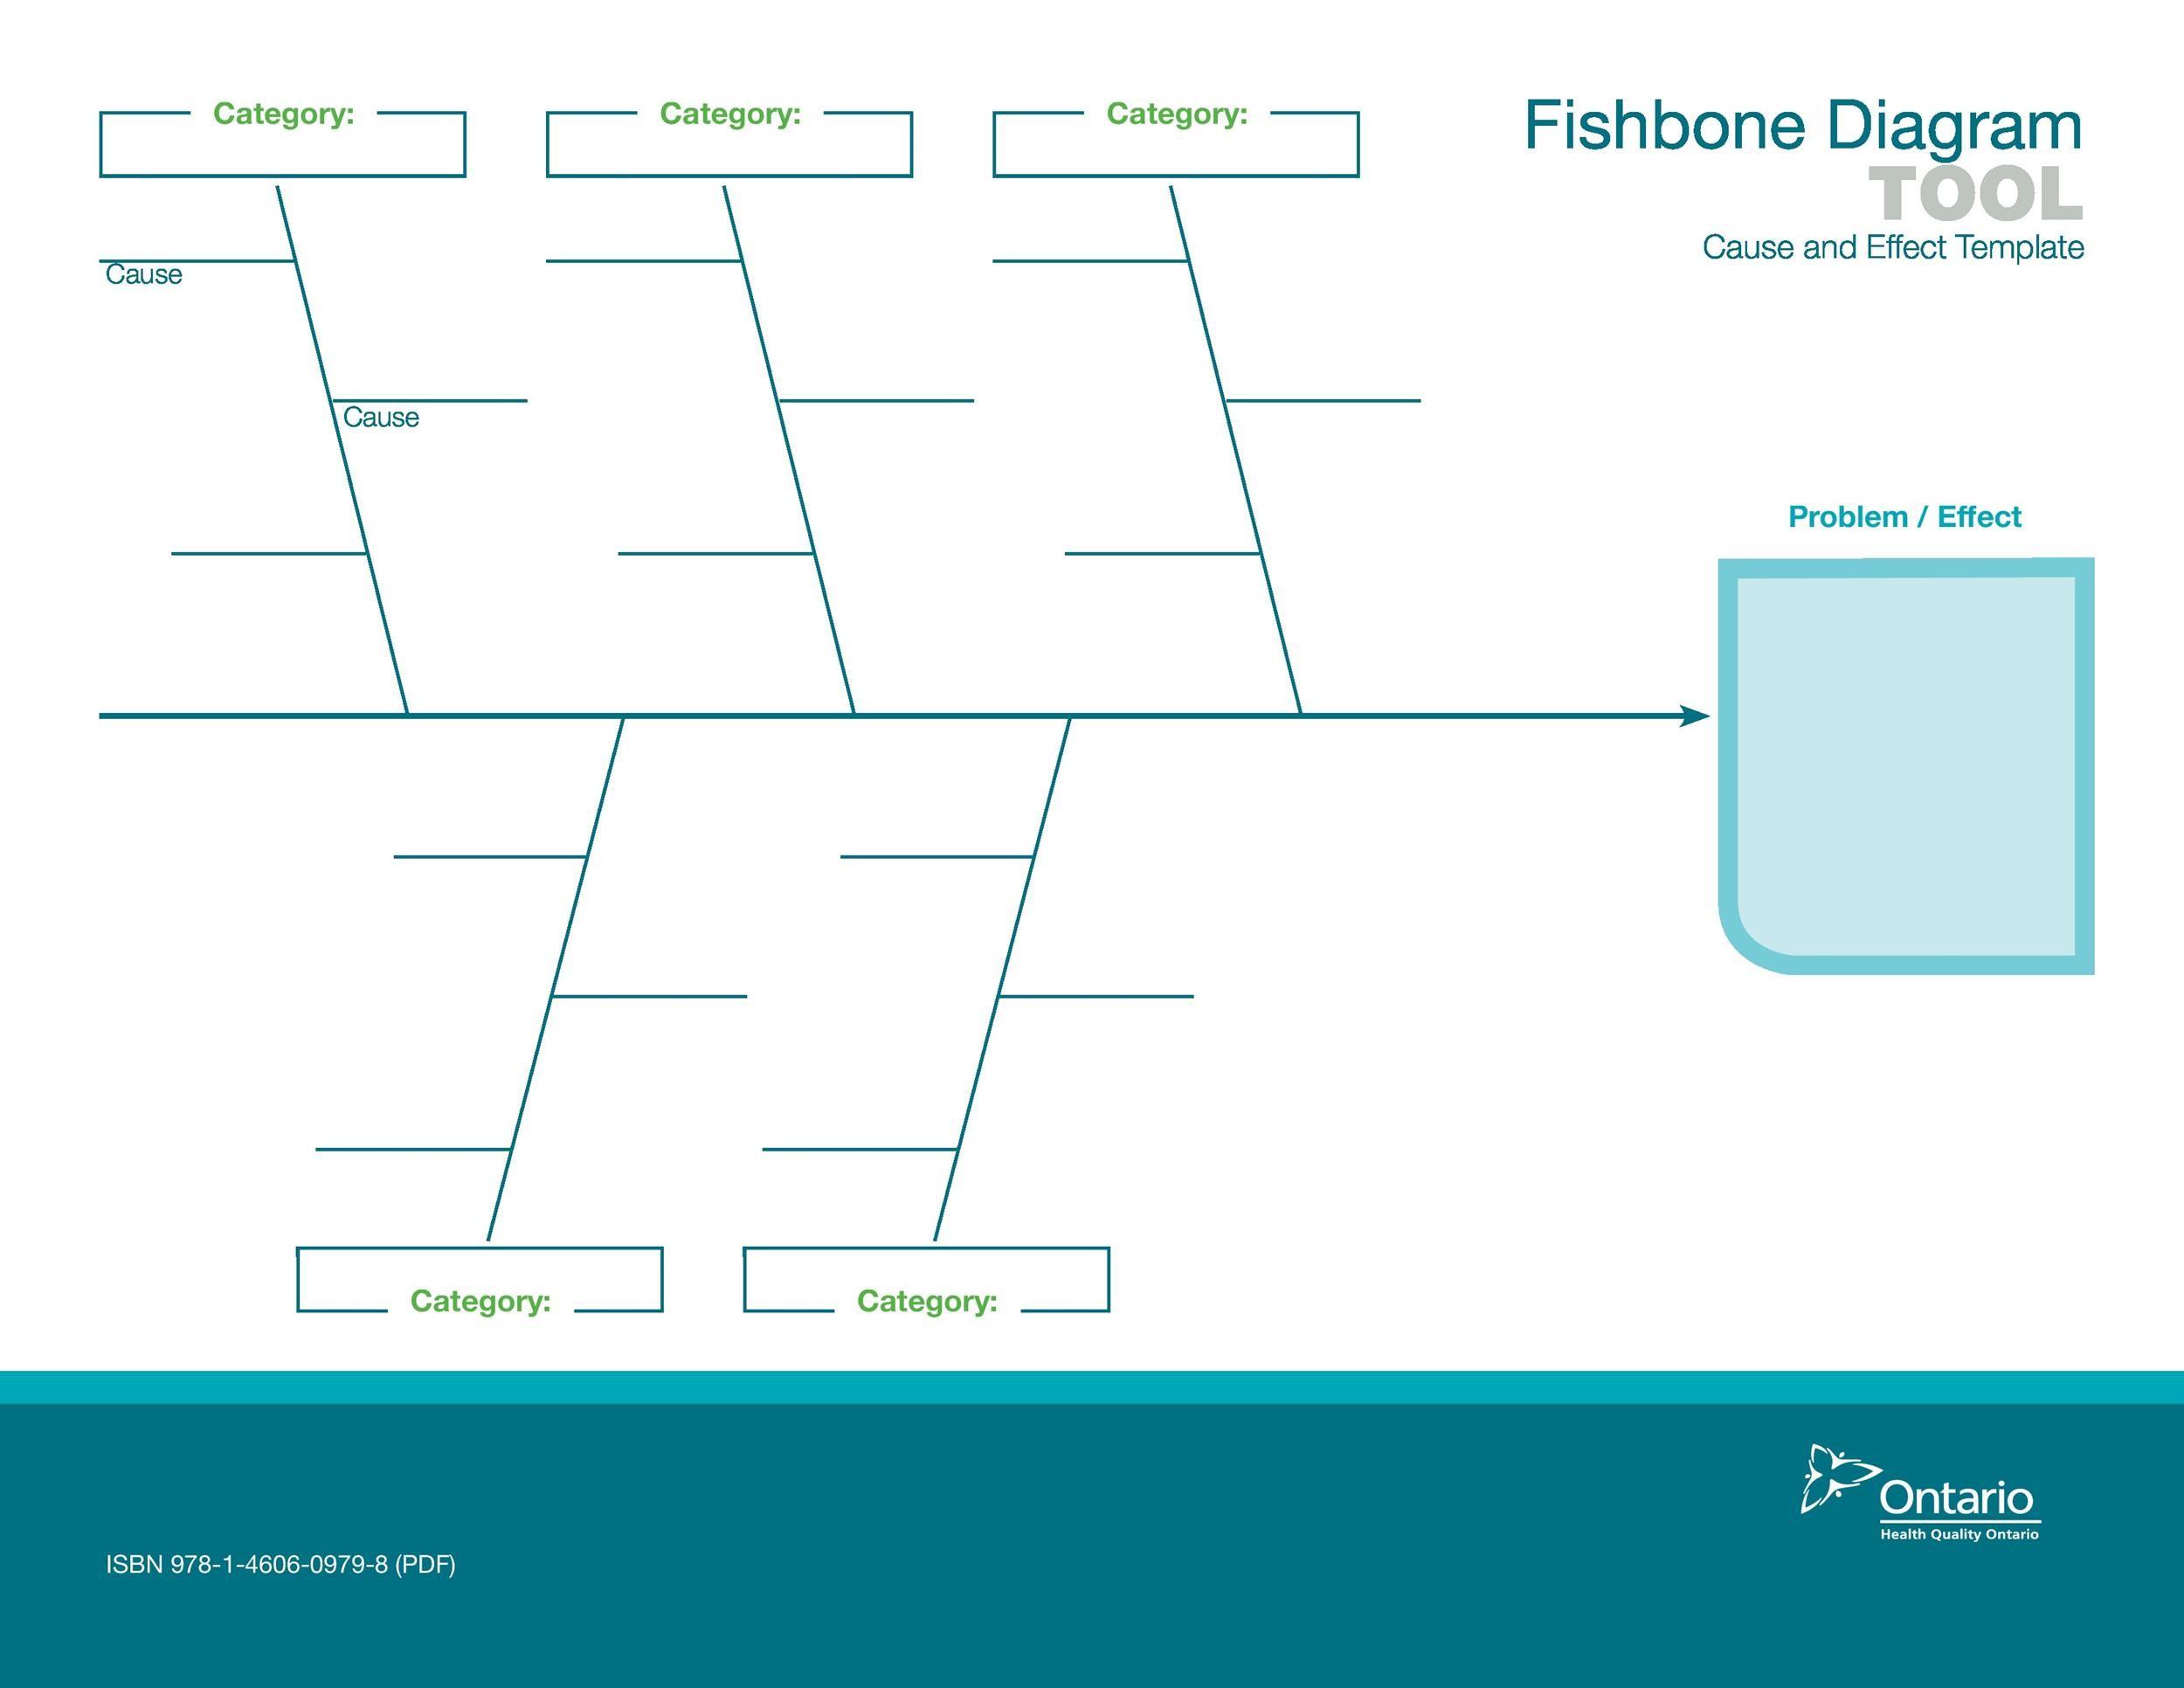 fishbone diagram nursing automotive wiring schematics 2 lft vertical great installation of 43 templates examples word excel rh templatelab com shorthand lab values